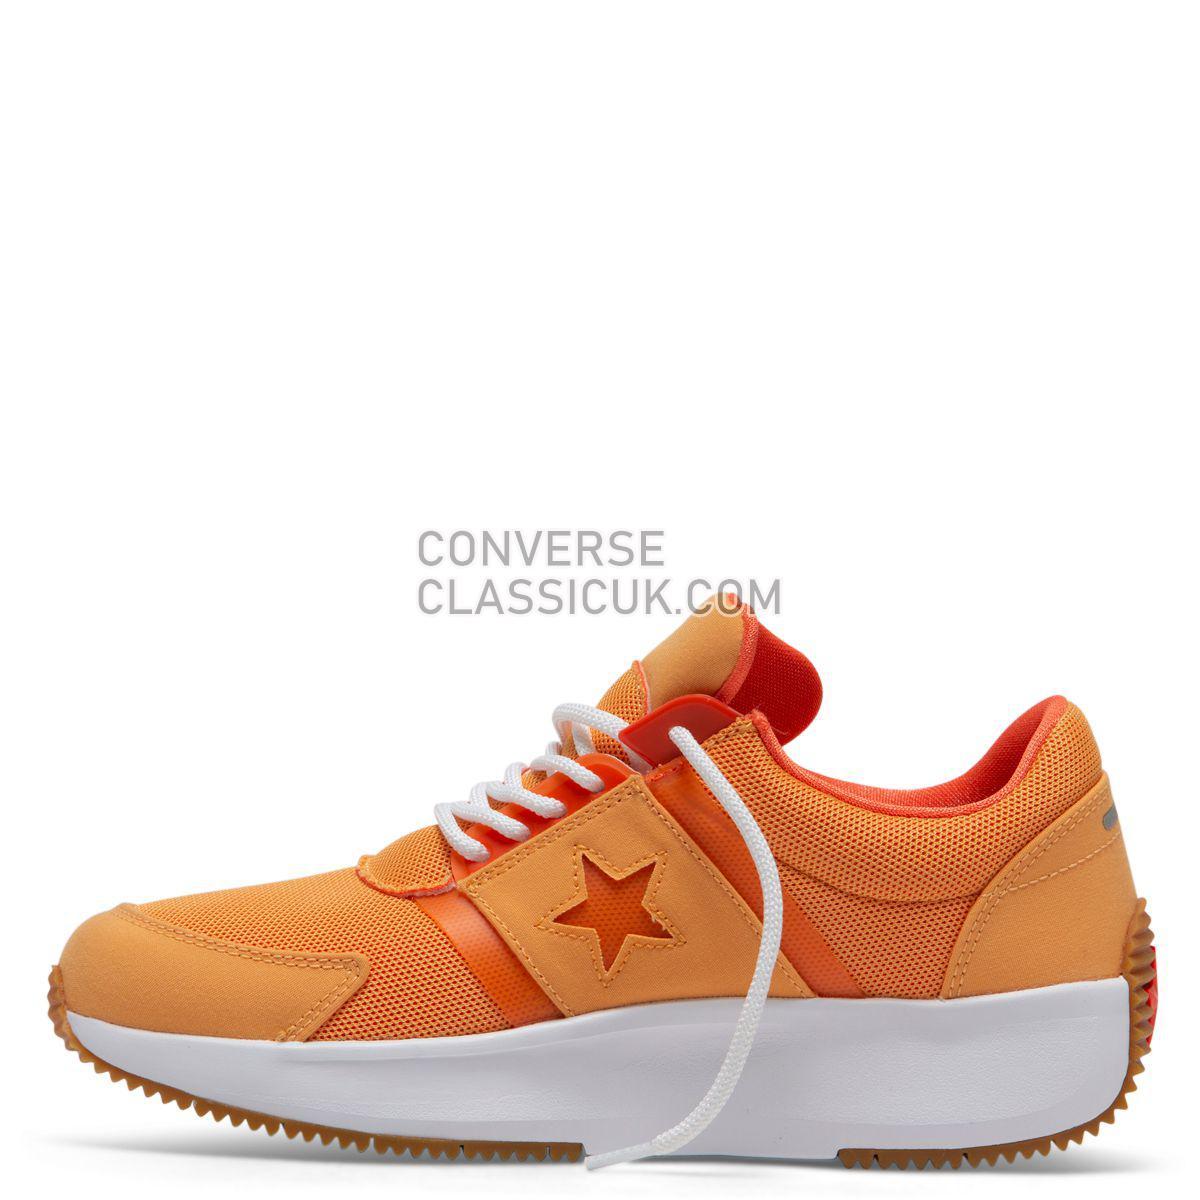 Converse Run Star Retro Glow Low Top Melon Baller Mens 164290 Melon Baller/Turf Orange/White Shoes